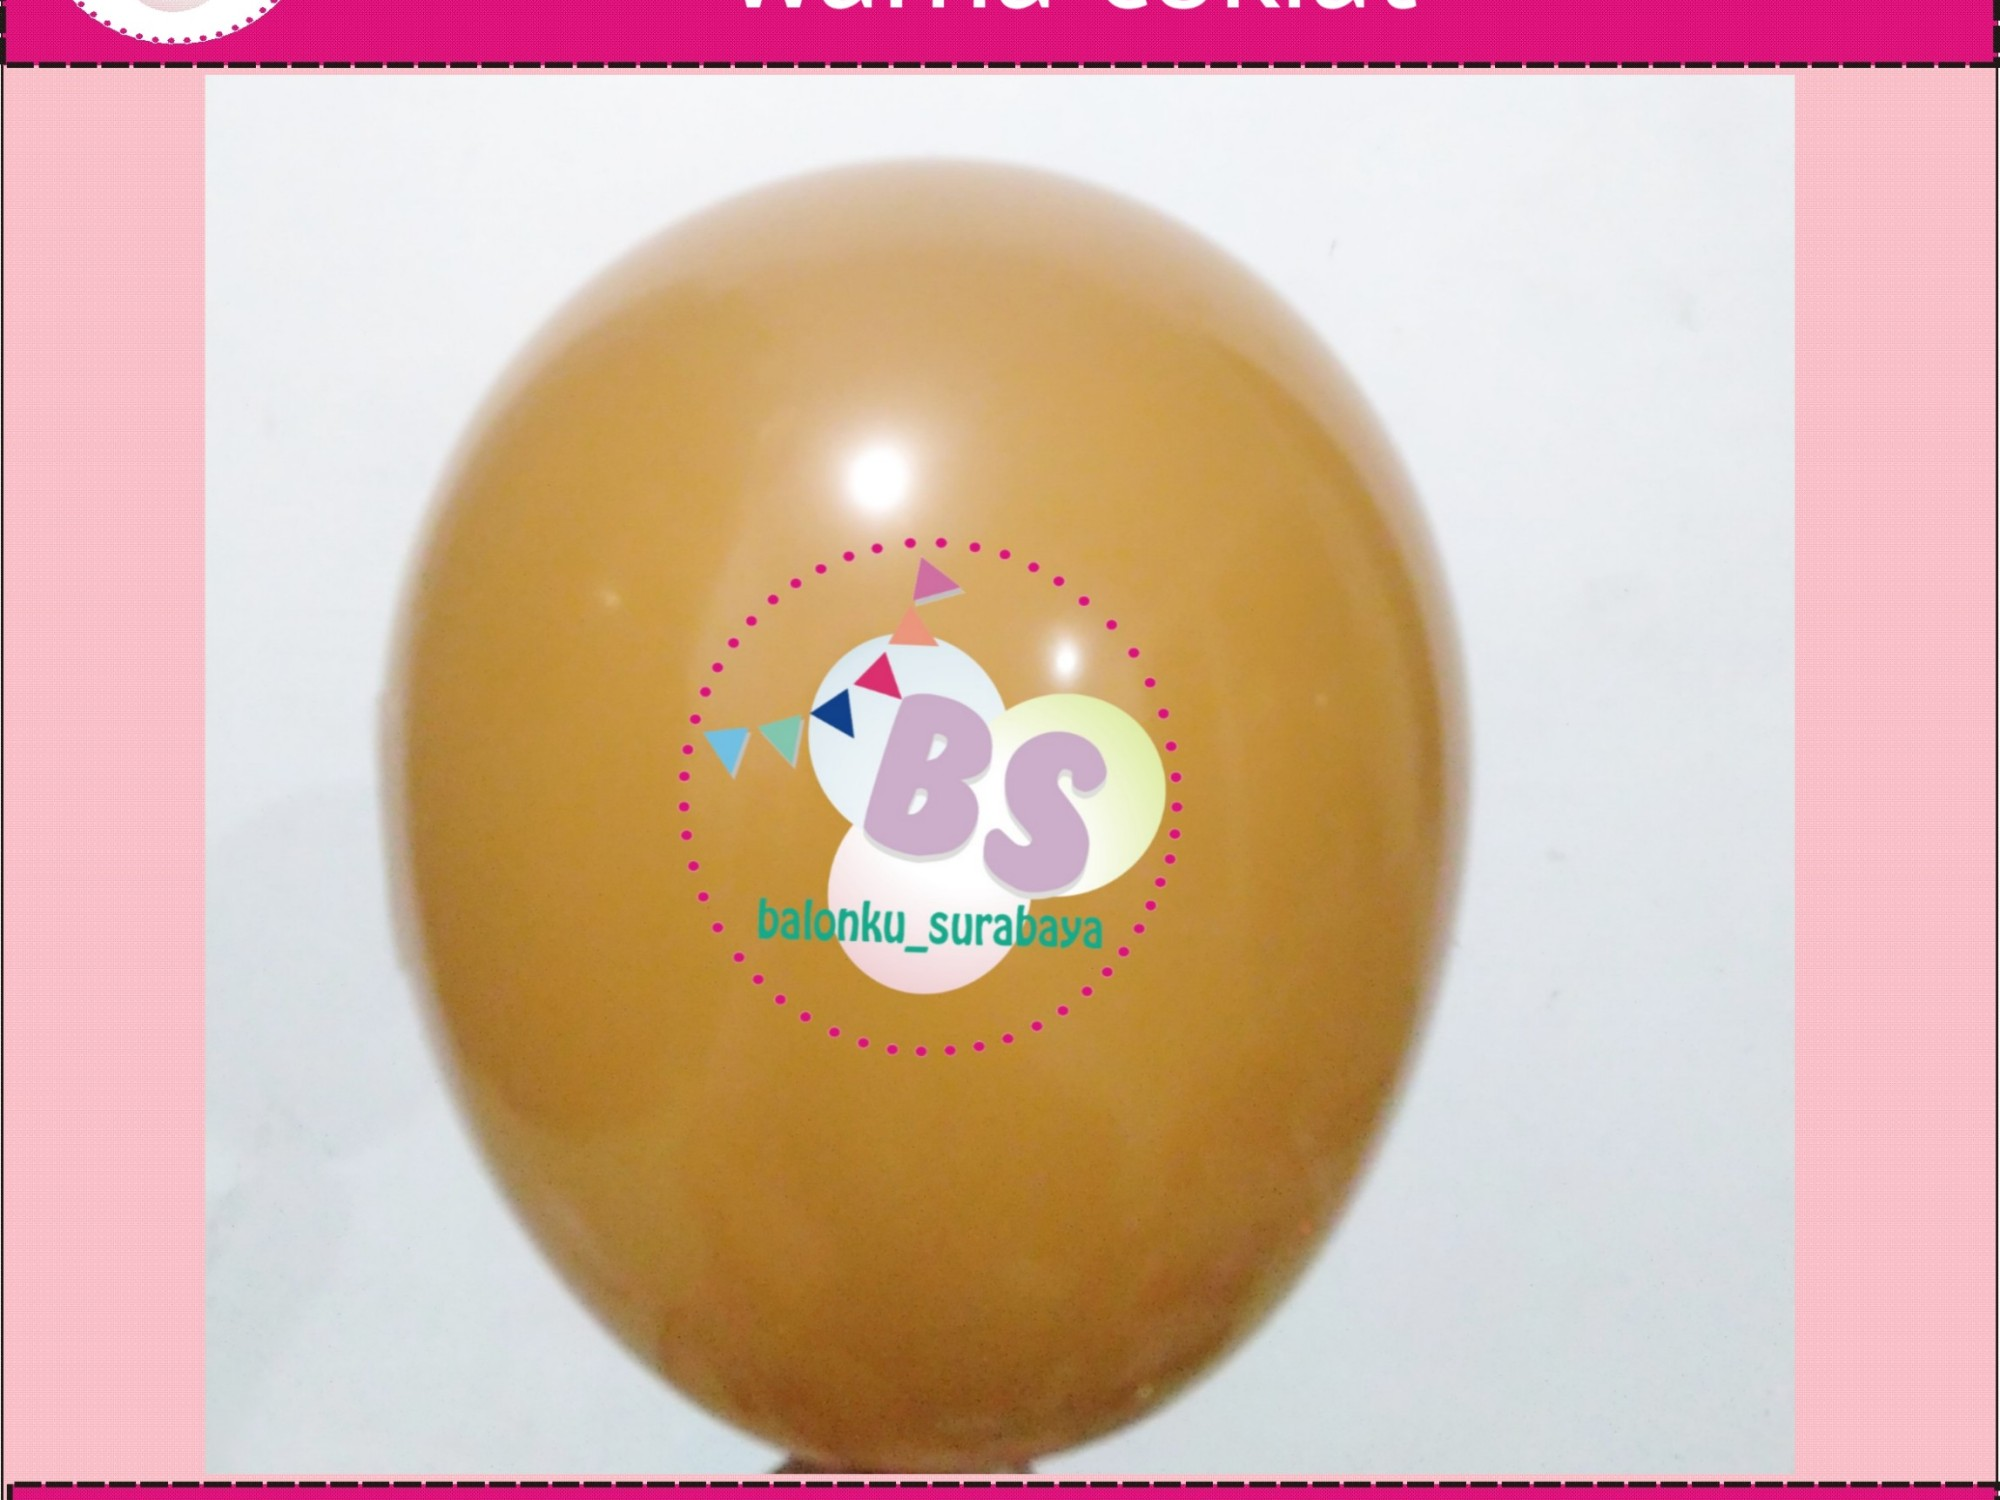 jual balon latex 5 inch Coklat, BAlon Gas,Bunga dekorasi,Rangkaian bunga artificial, Buket bunga, buket bunga mawar, harga buket bunga,Balon sablon, balon Printing, balon promosi, , Perlengkapan ulang tahun, Balon latex , balon doff, balon latex, balon doff merah, balon natal, balon agustusan, balon dekorasi, balonku Surabaya, 085733133529